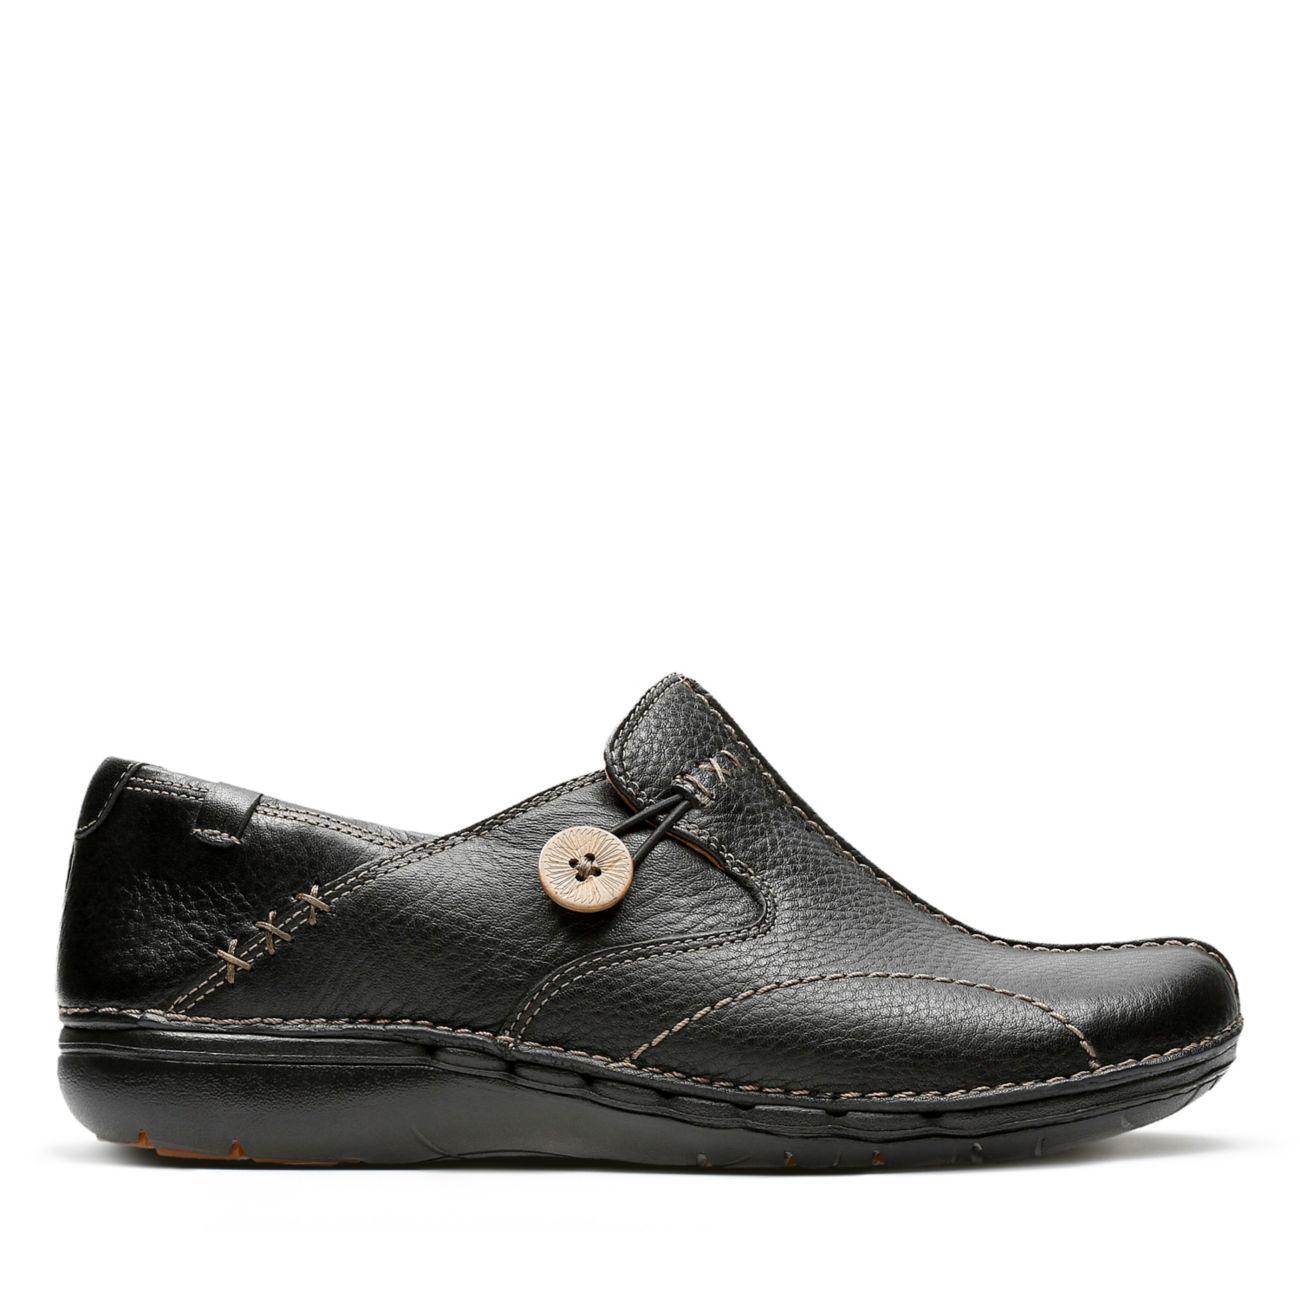 9a52527a0f Nurses Shoes | Best Shoes for Nurses in Black Leather | Clarks